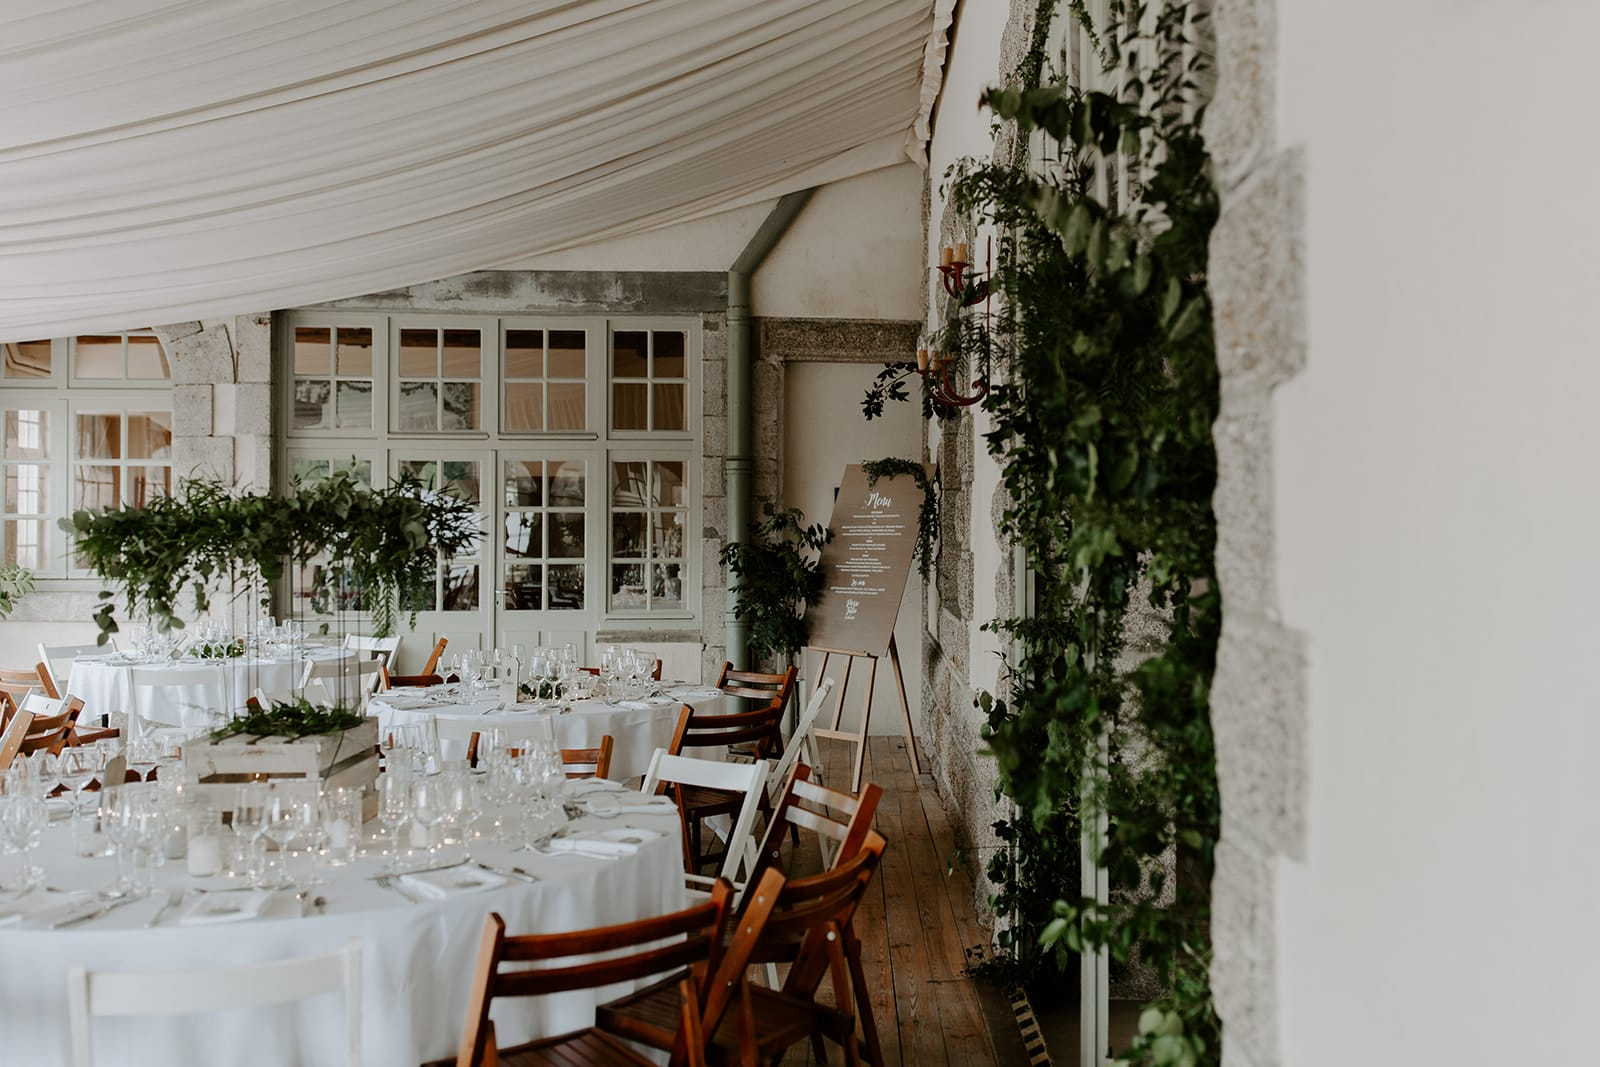 mariage_chateau_la_flocelliere_vendee_flavie_nelly_photographe-8-obonheurdesdames-decoration-mariage-location-vegetal